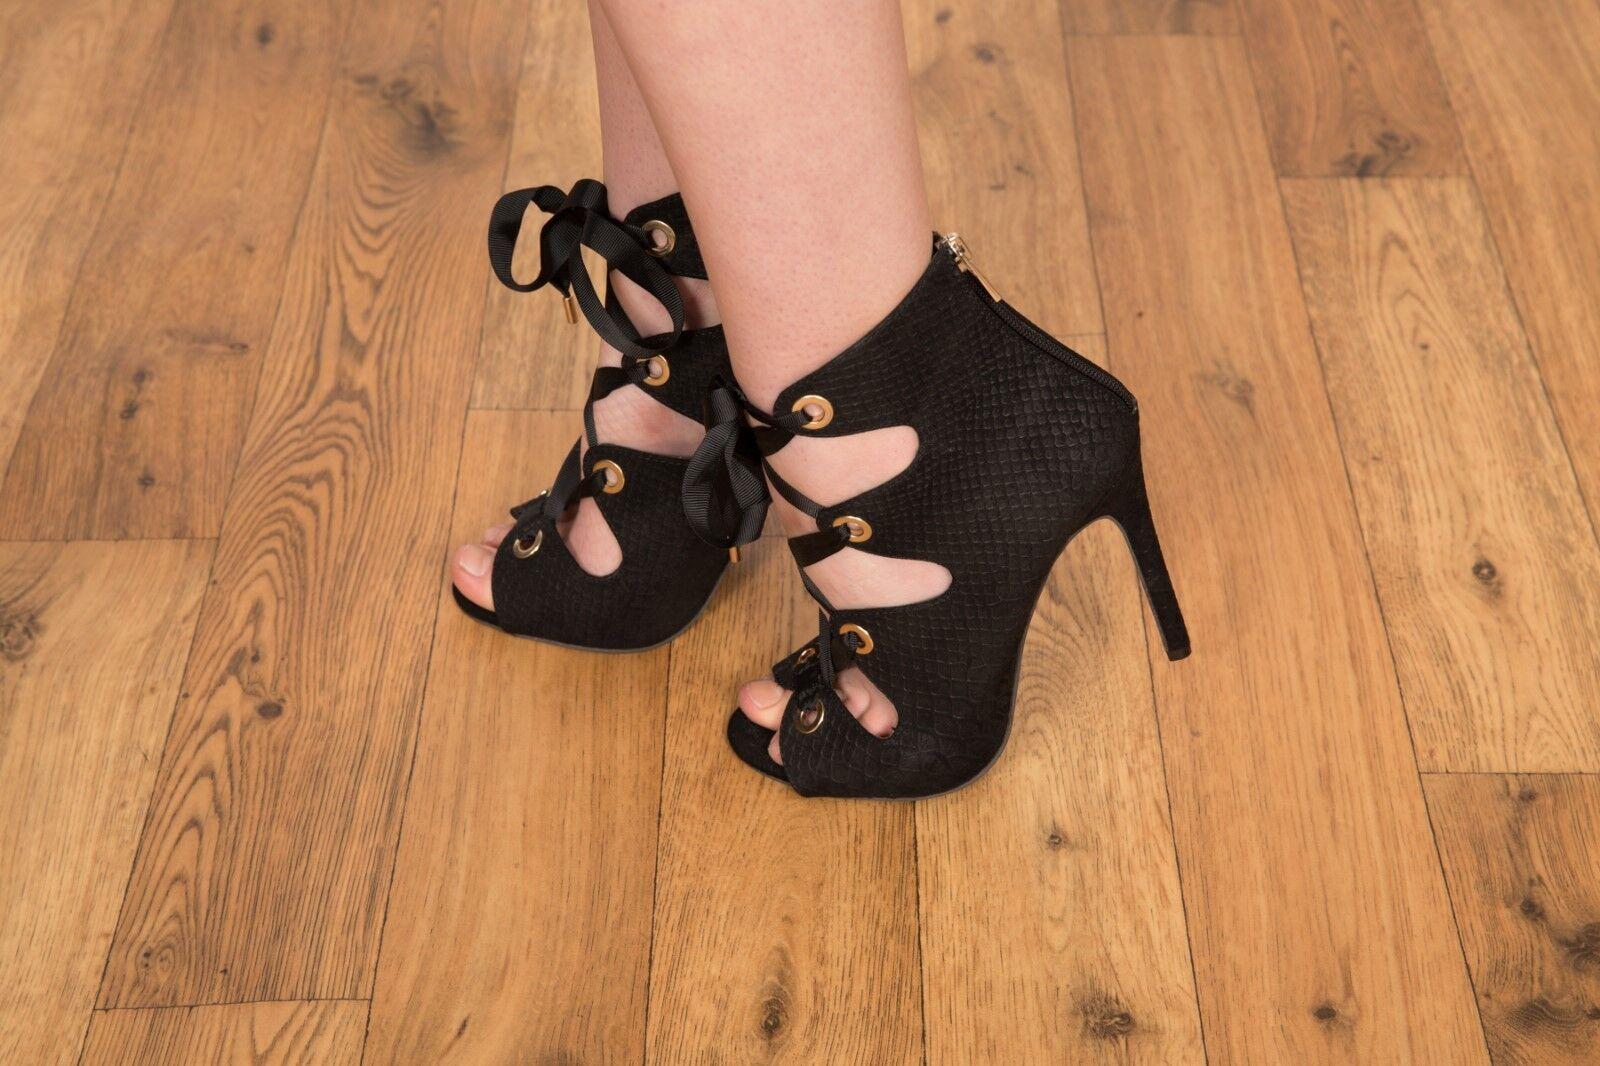 Designer style black & gold faux snakeskin peeptoe ribbon lace up heels size 5